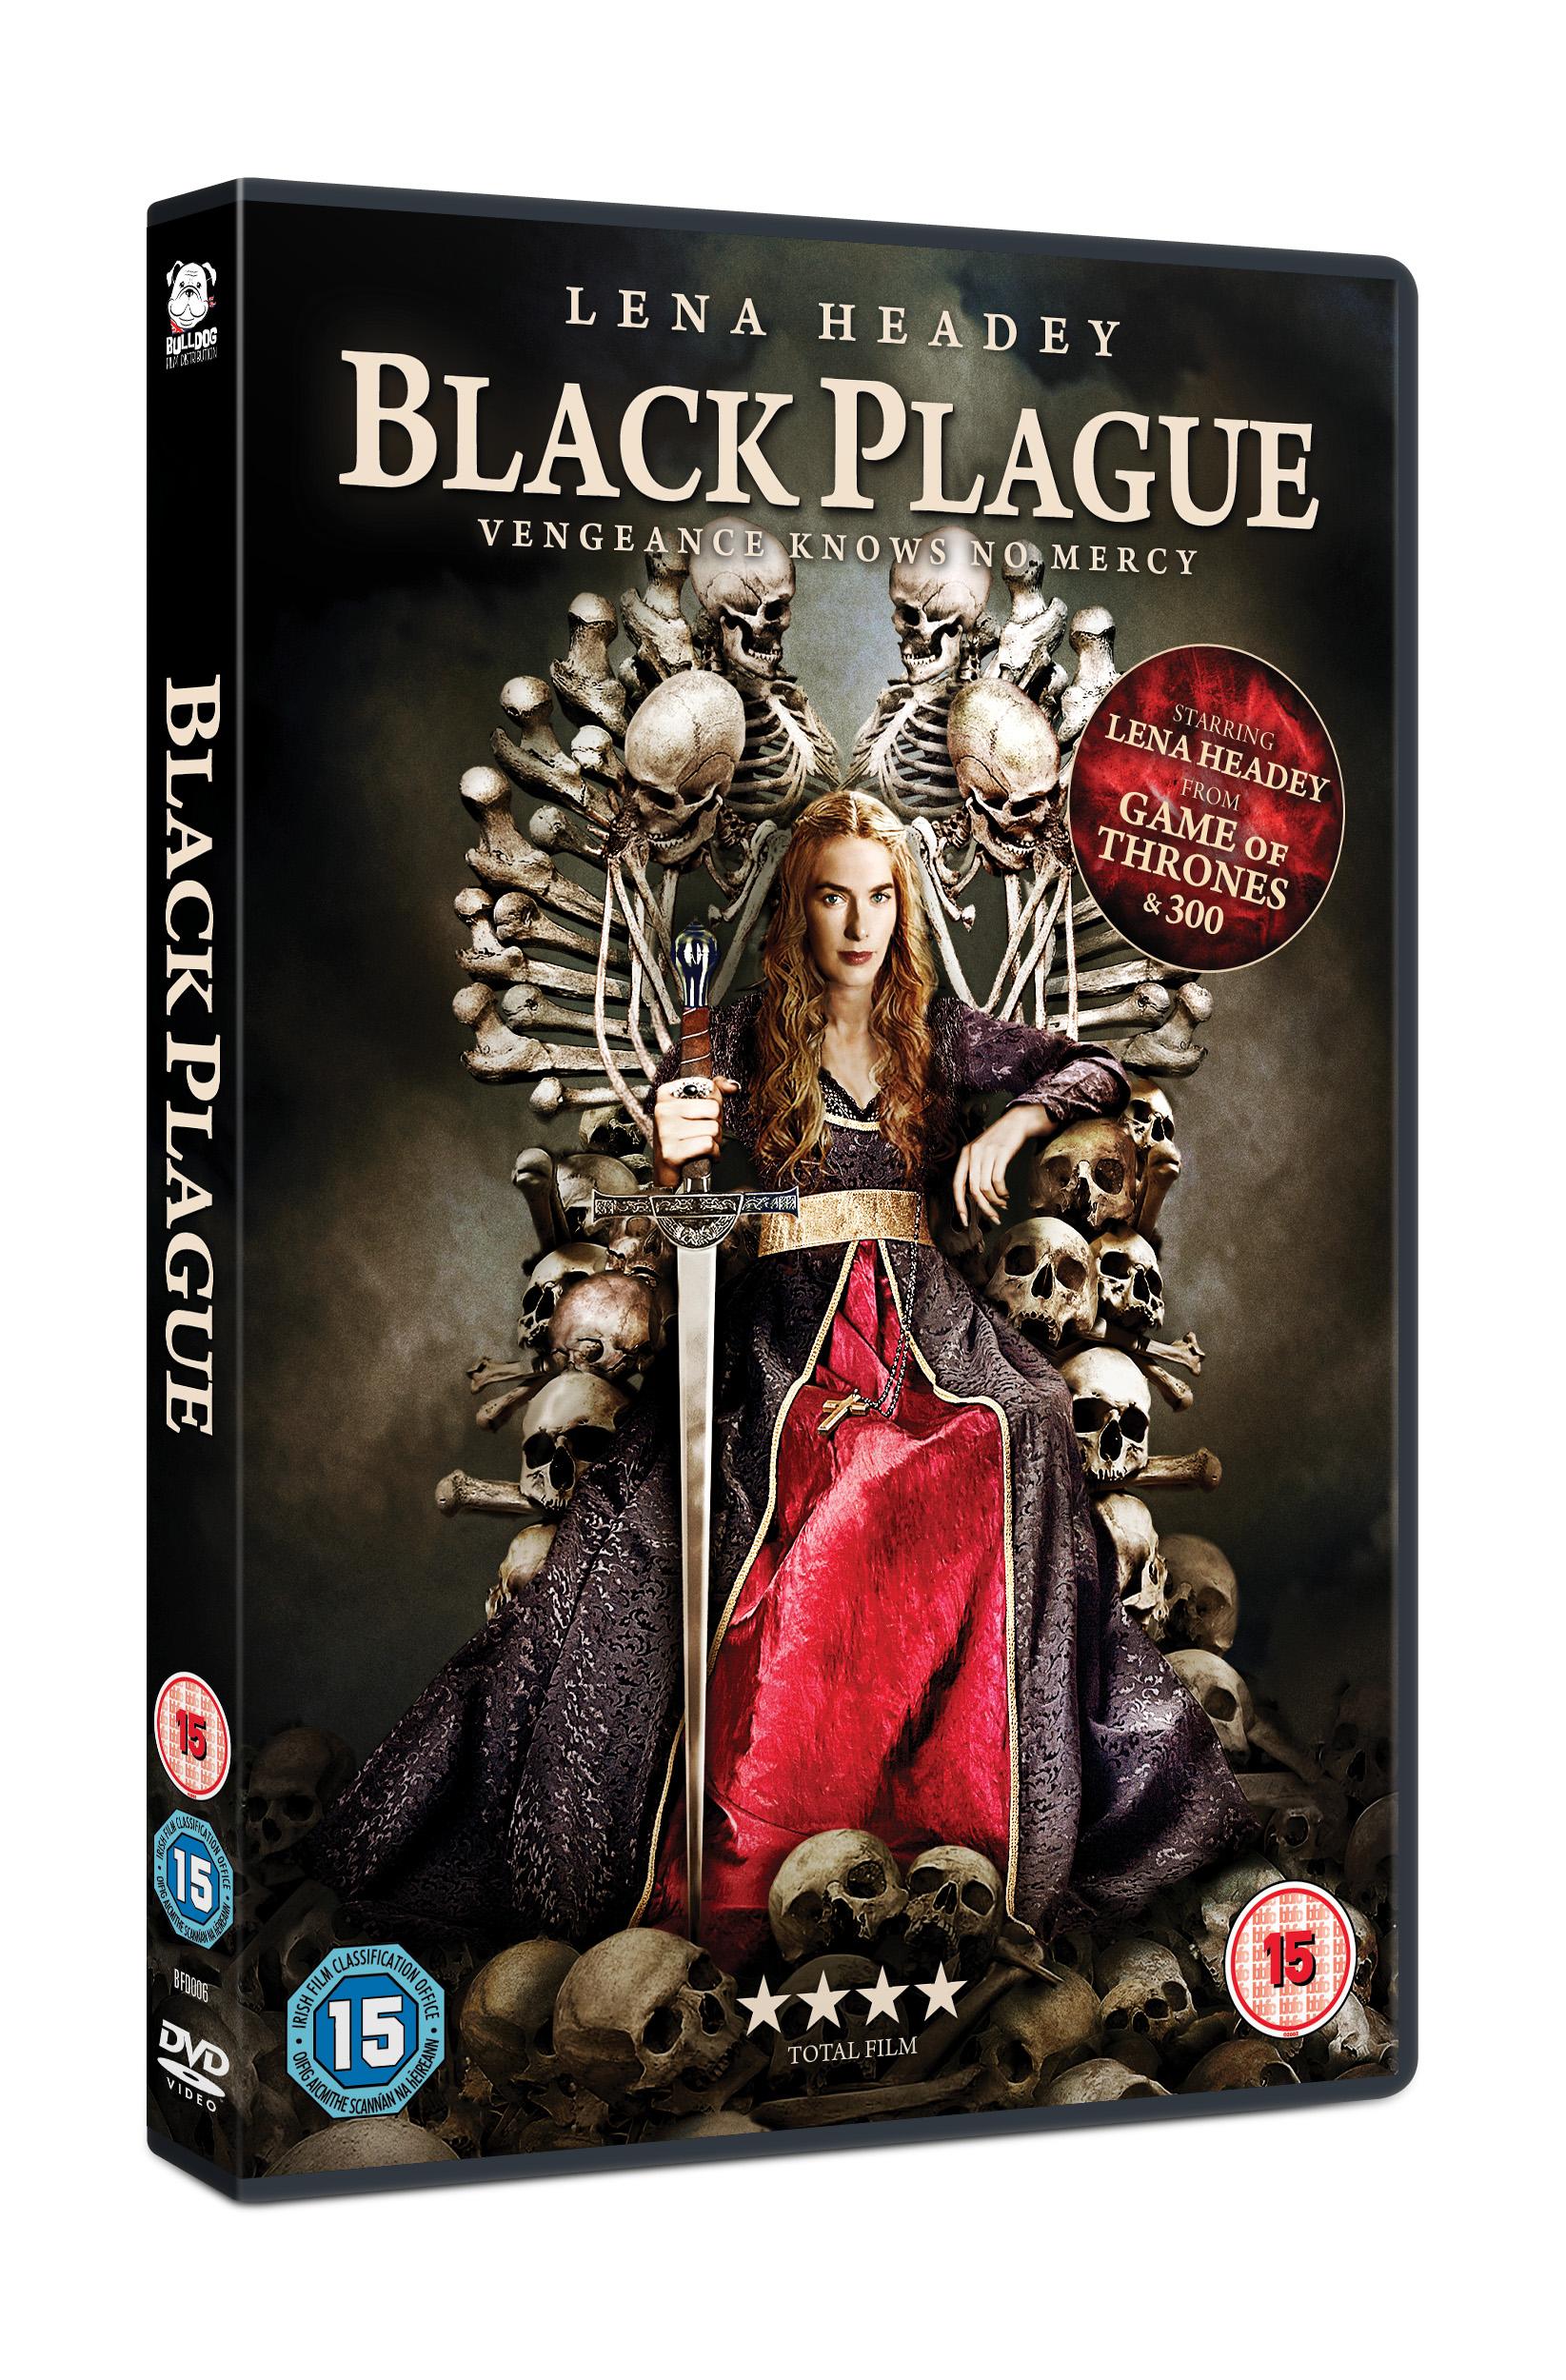 Black Plague DVD